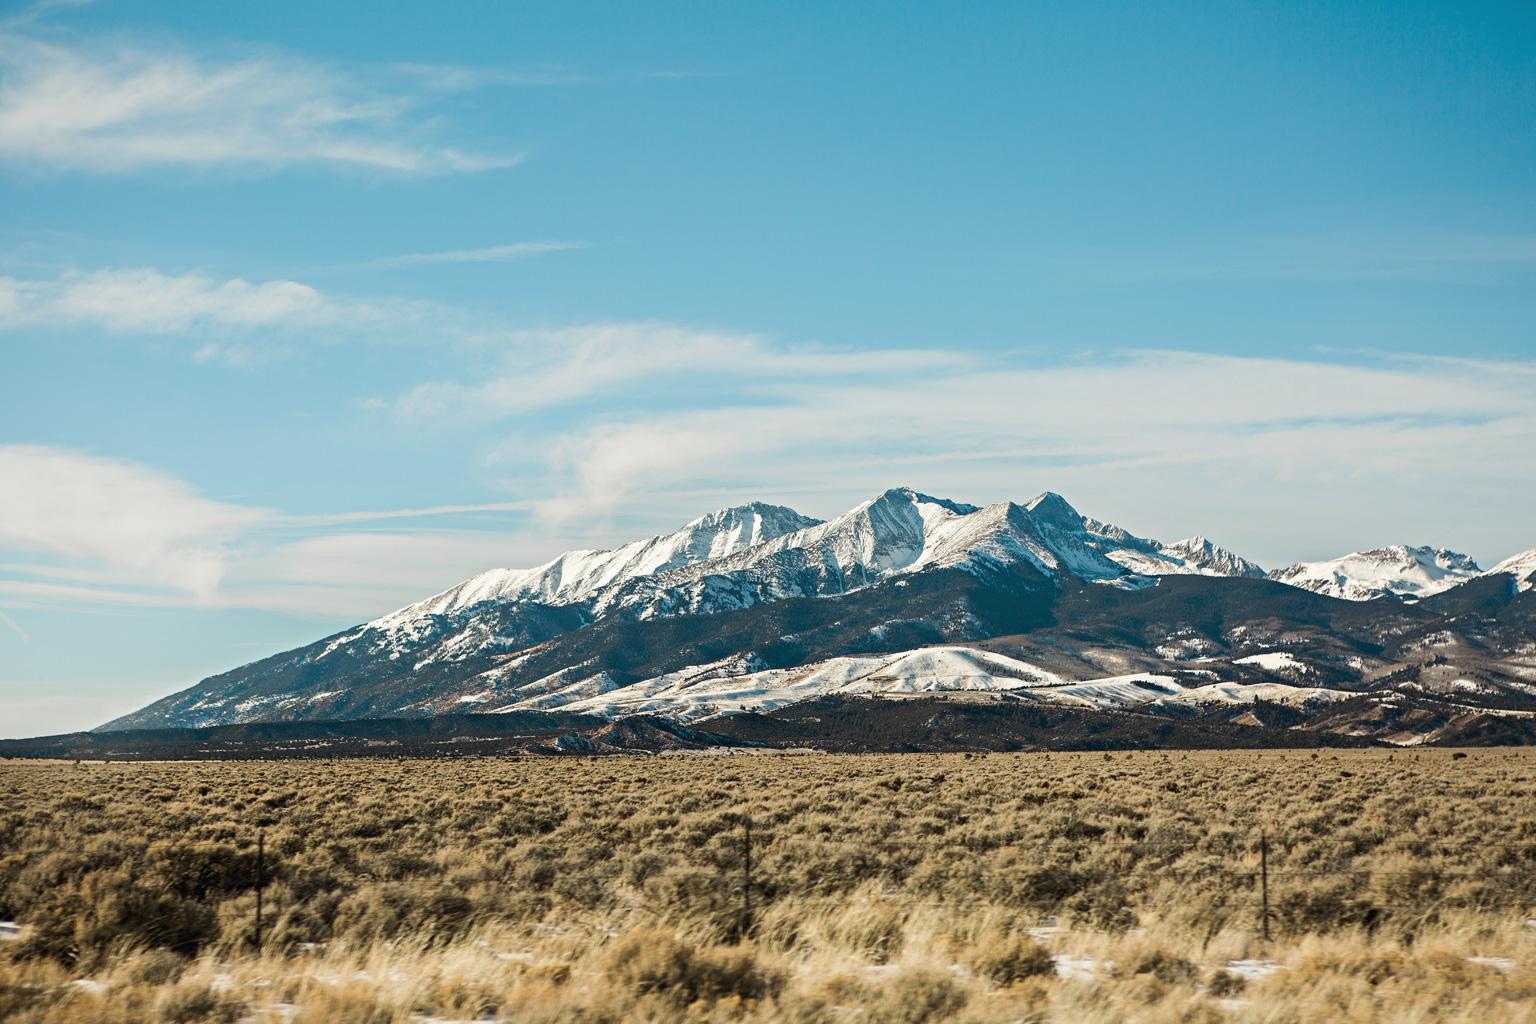 CindyGiovagnoli_Great_Sand_Dunes_National_Park_NPS_Colorado_roadtrip-007.jpg